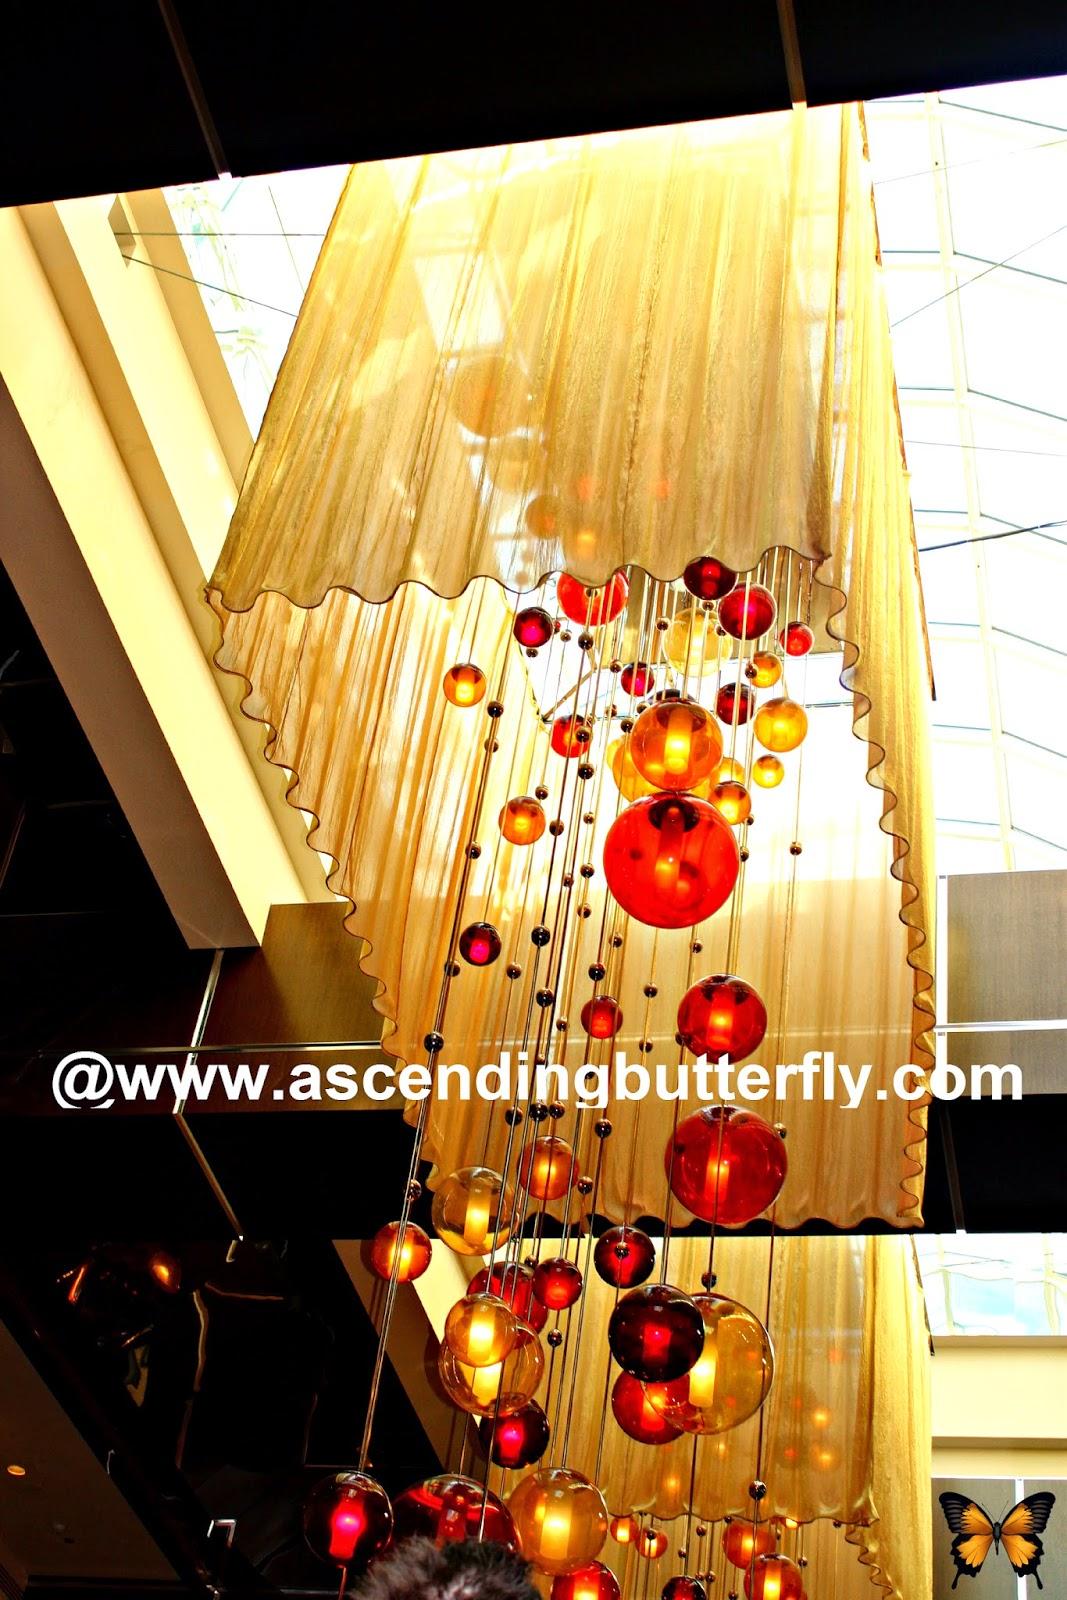 Atlantic City, Visit AC, Atlantic City Alliance, DO AC, Golden Nugget Casino Chandelier